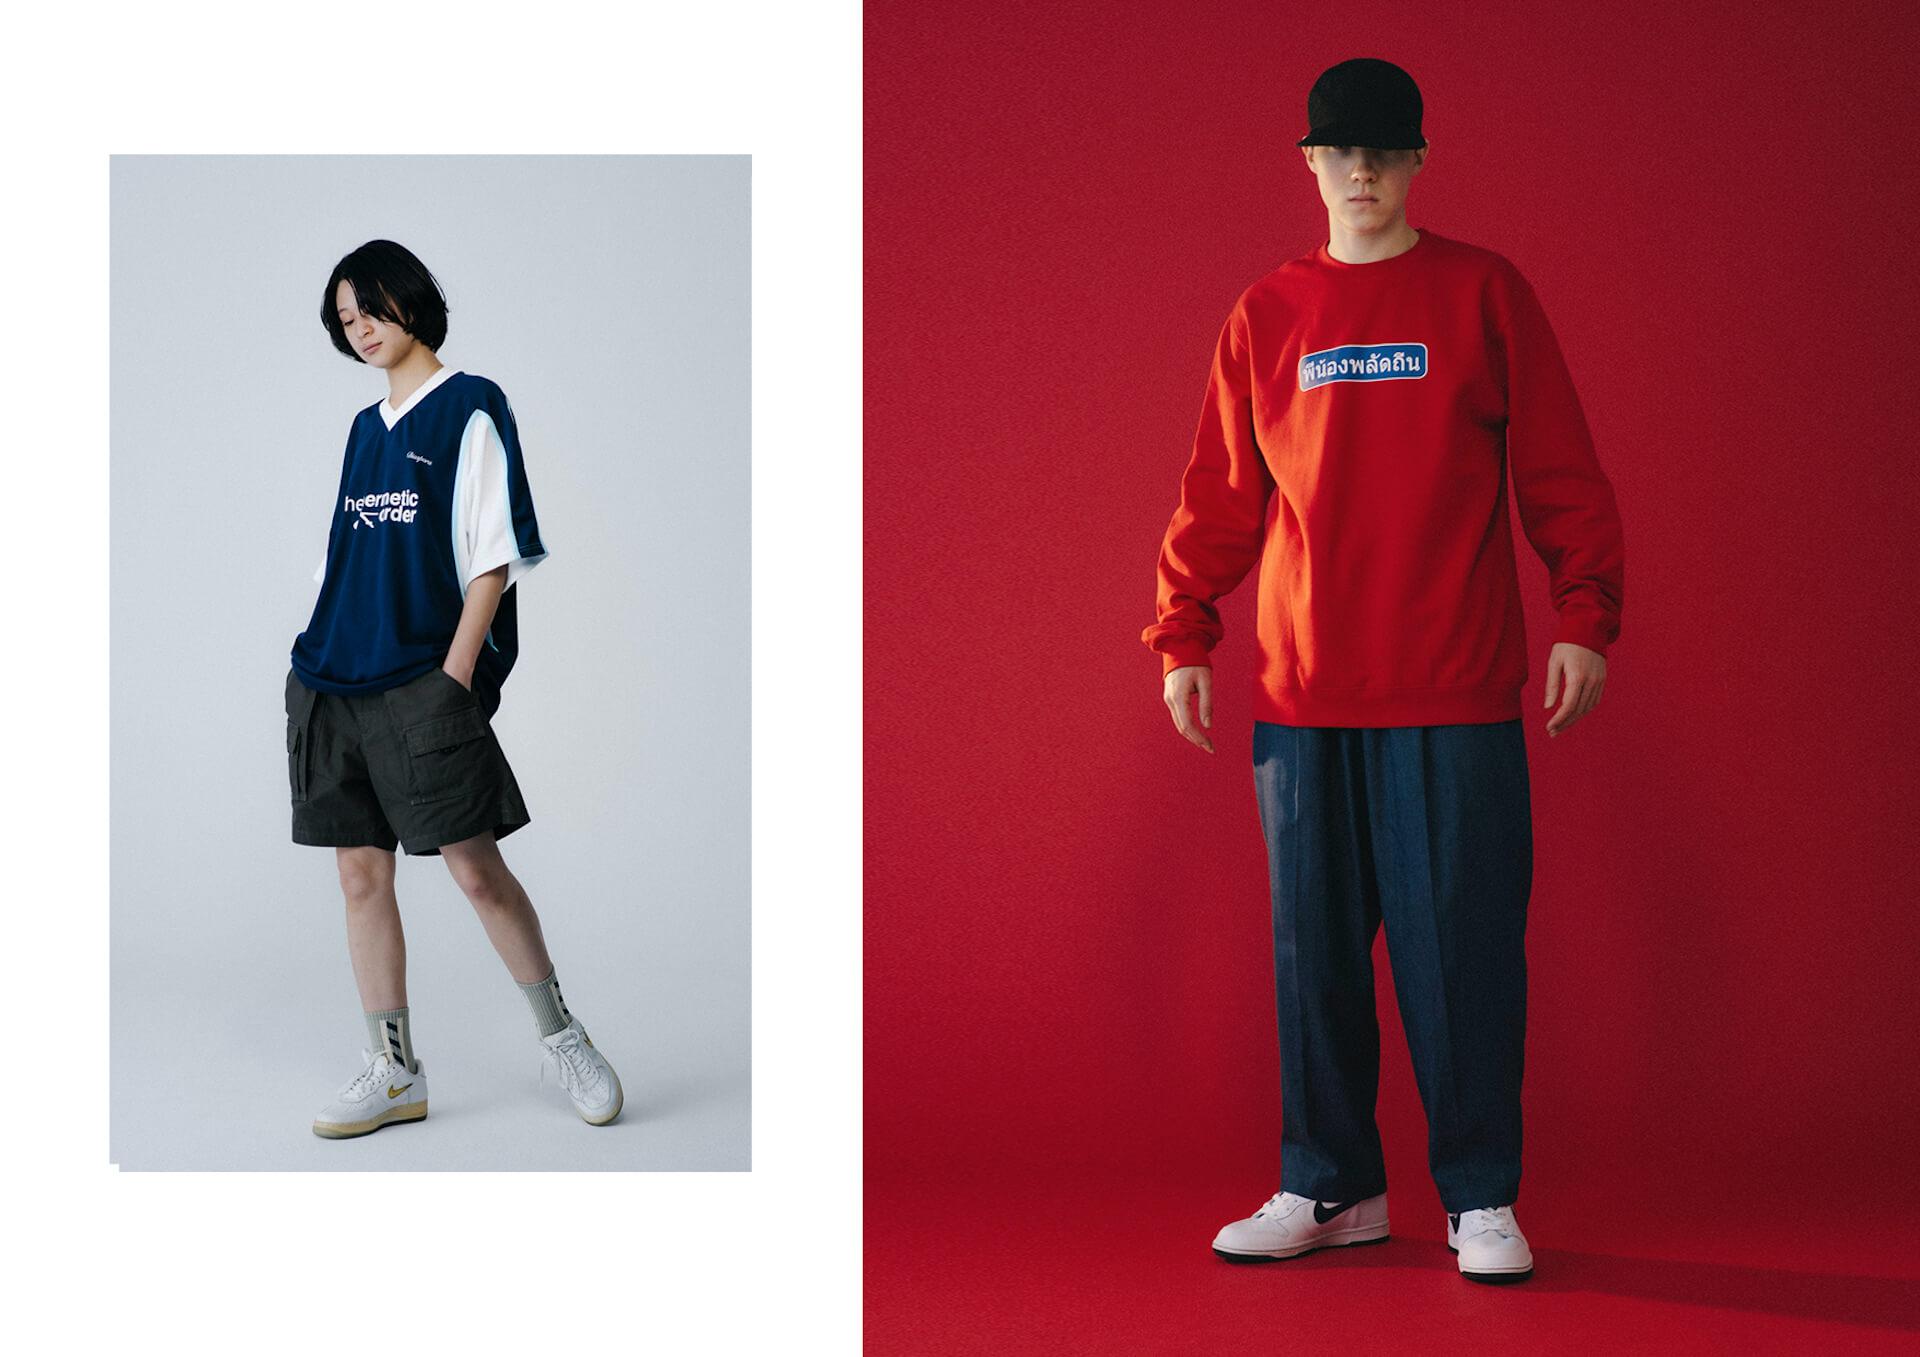 Diaspora skateboardsが2021SSのルックビジュアルを公開!モデルにはmiuらを起用 fashion210225_diasporaskateboards-08